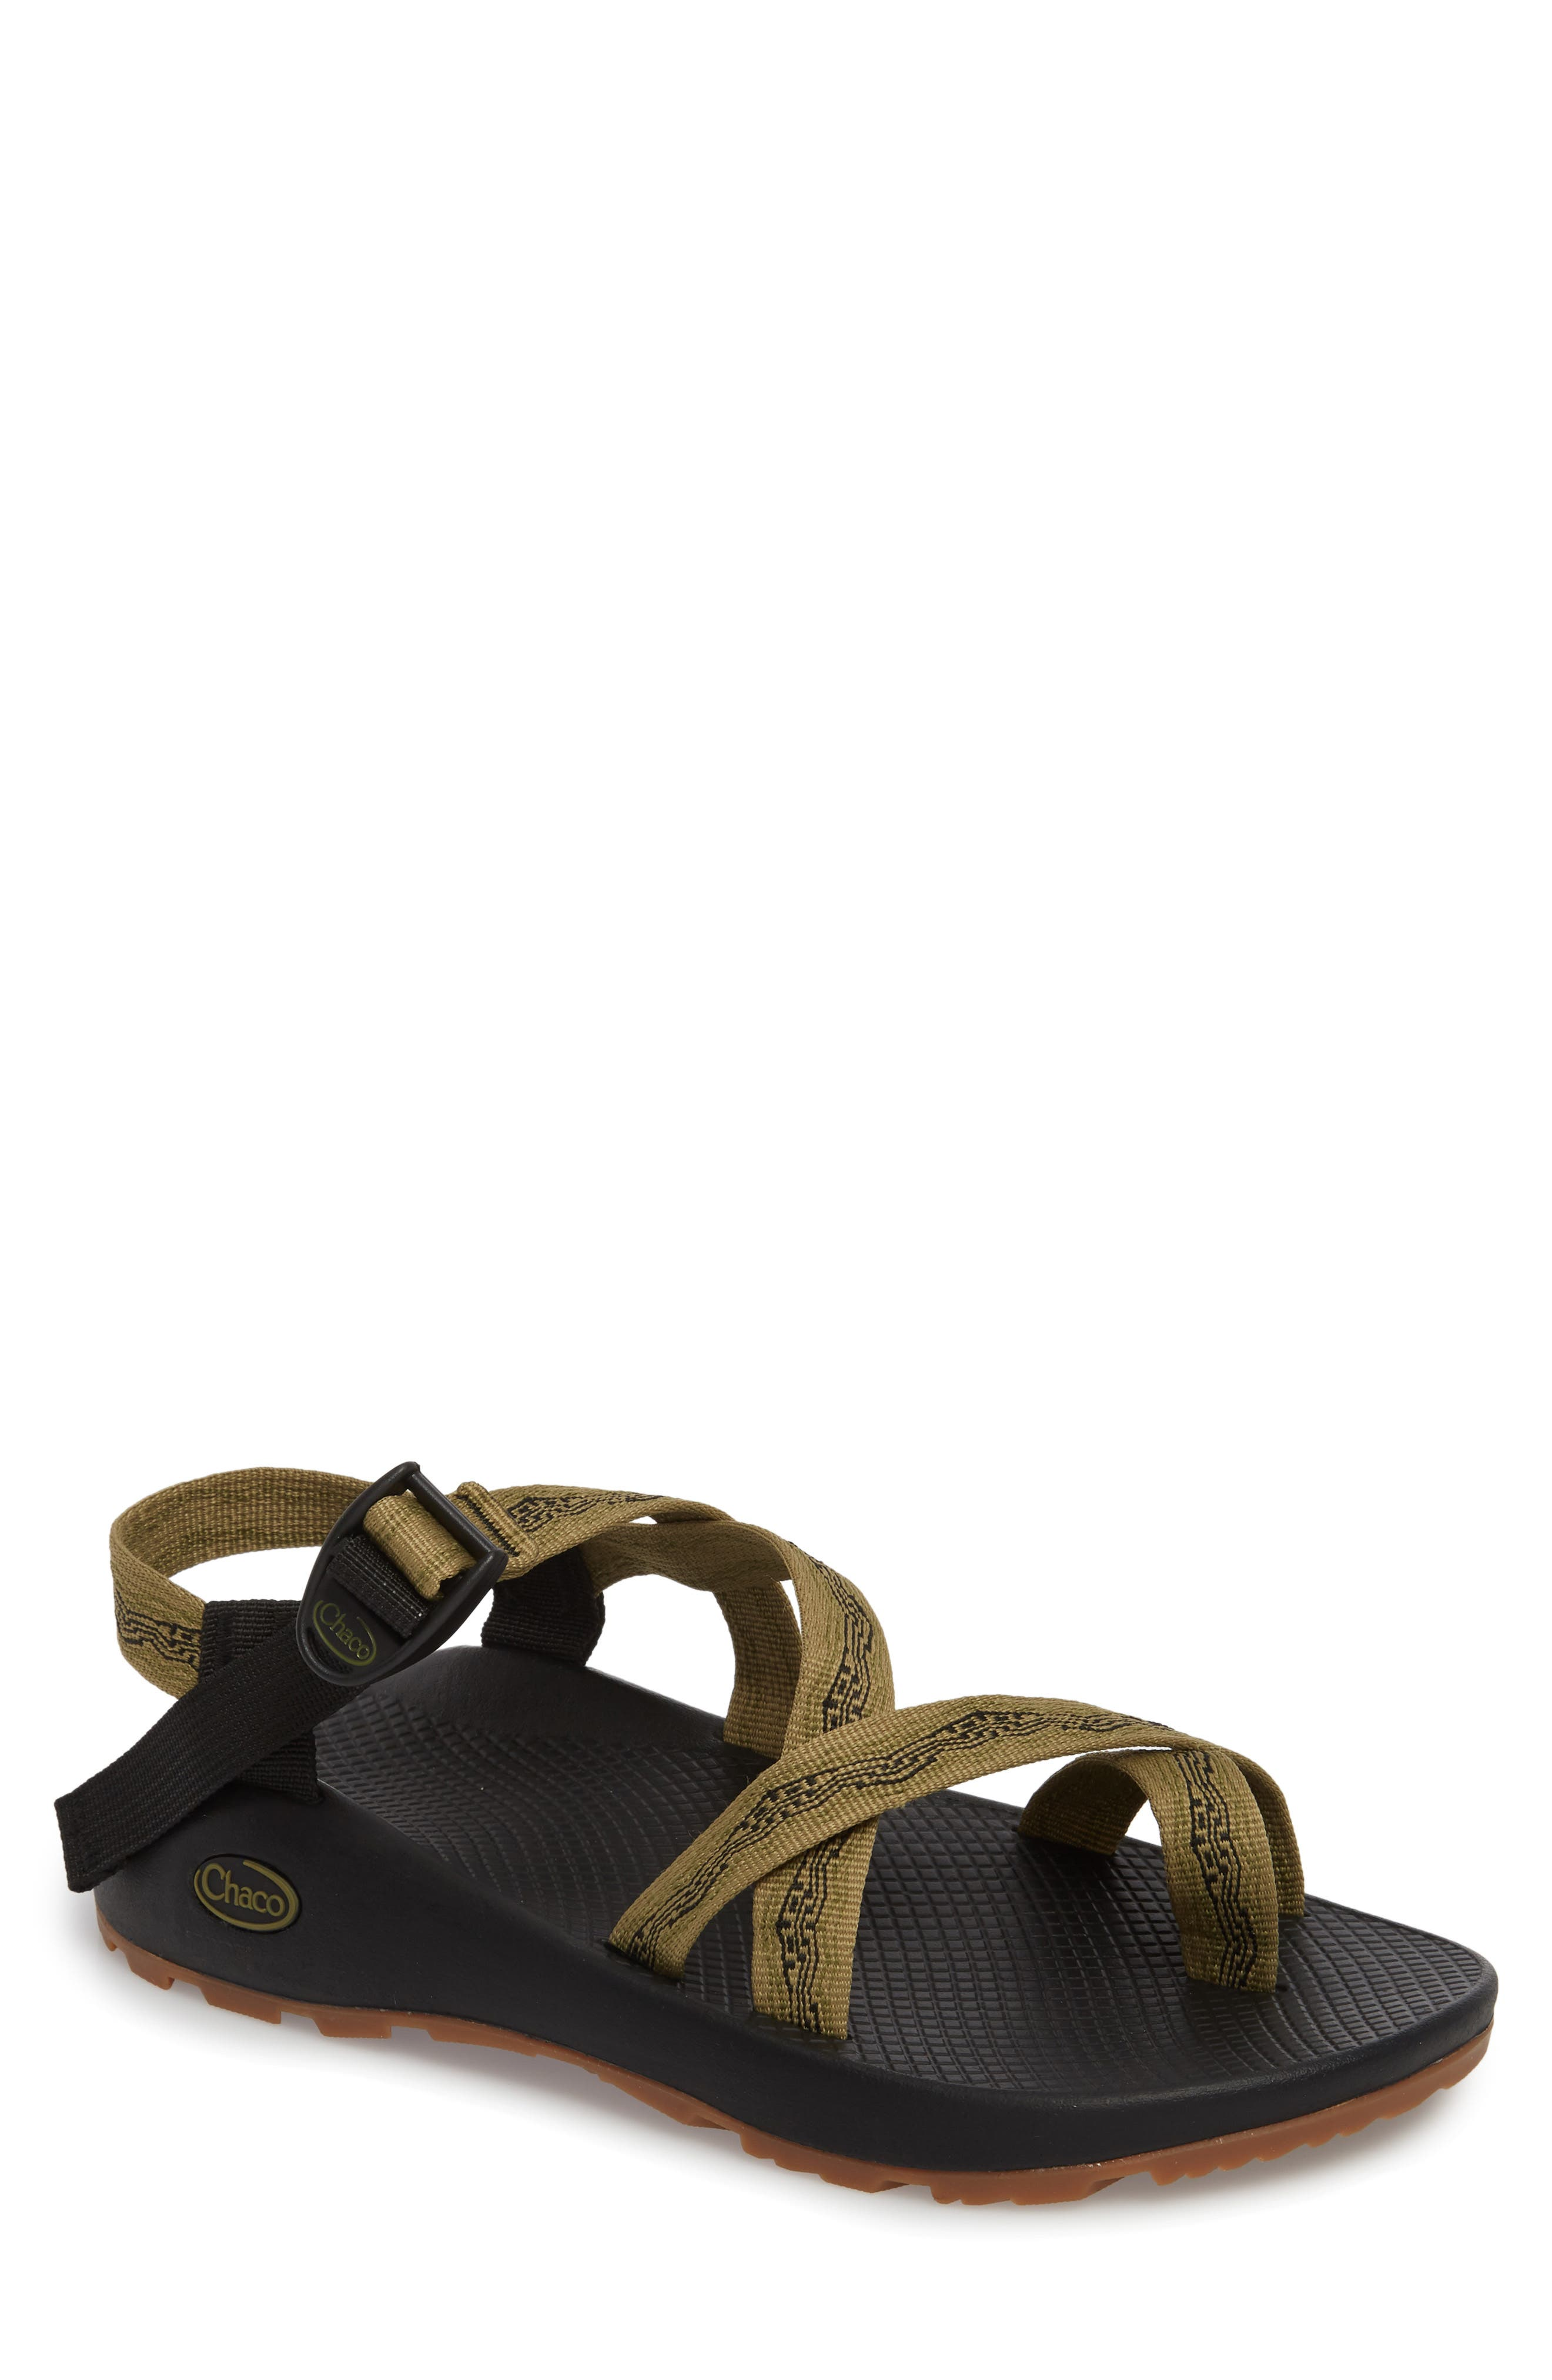 Z/2 Classic Sport Sandal,                         Main,                         color, Tri Boa